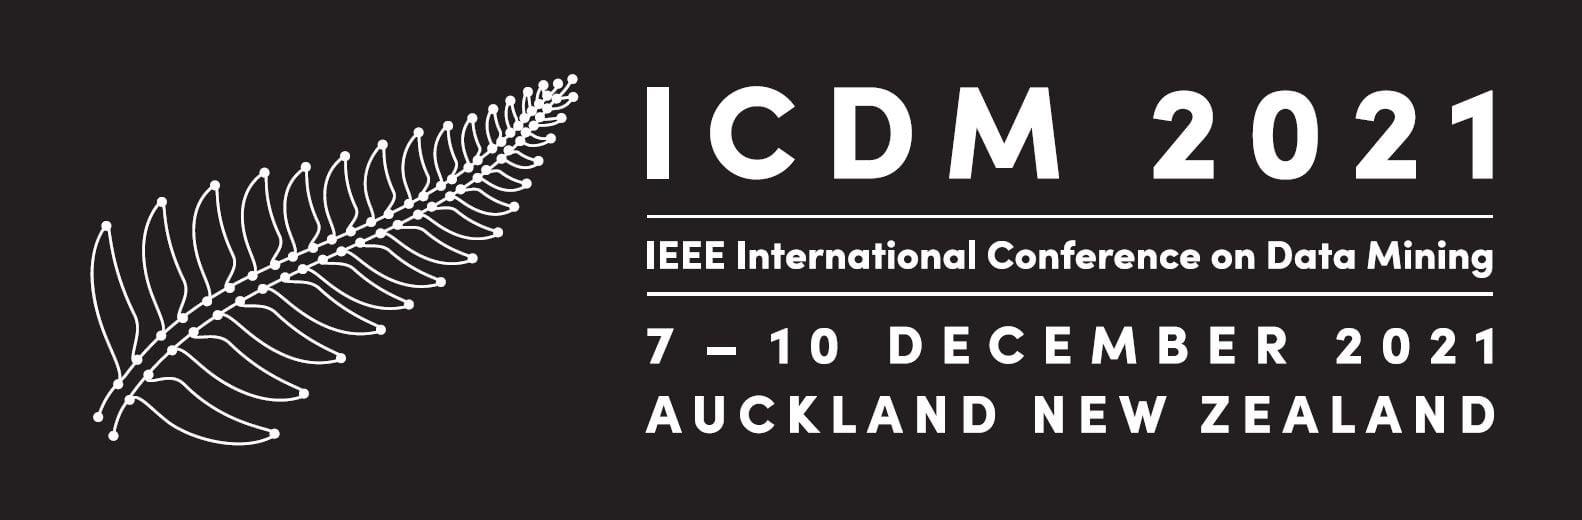 IEEE International Conference on Data Mining 2021 (ICDM2021)